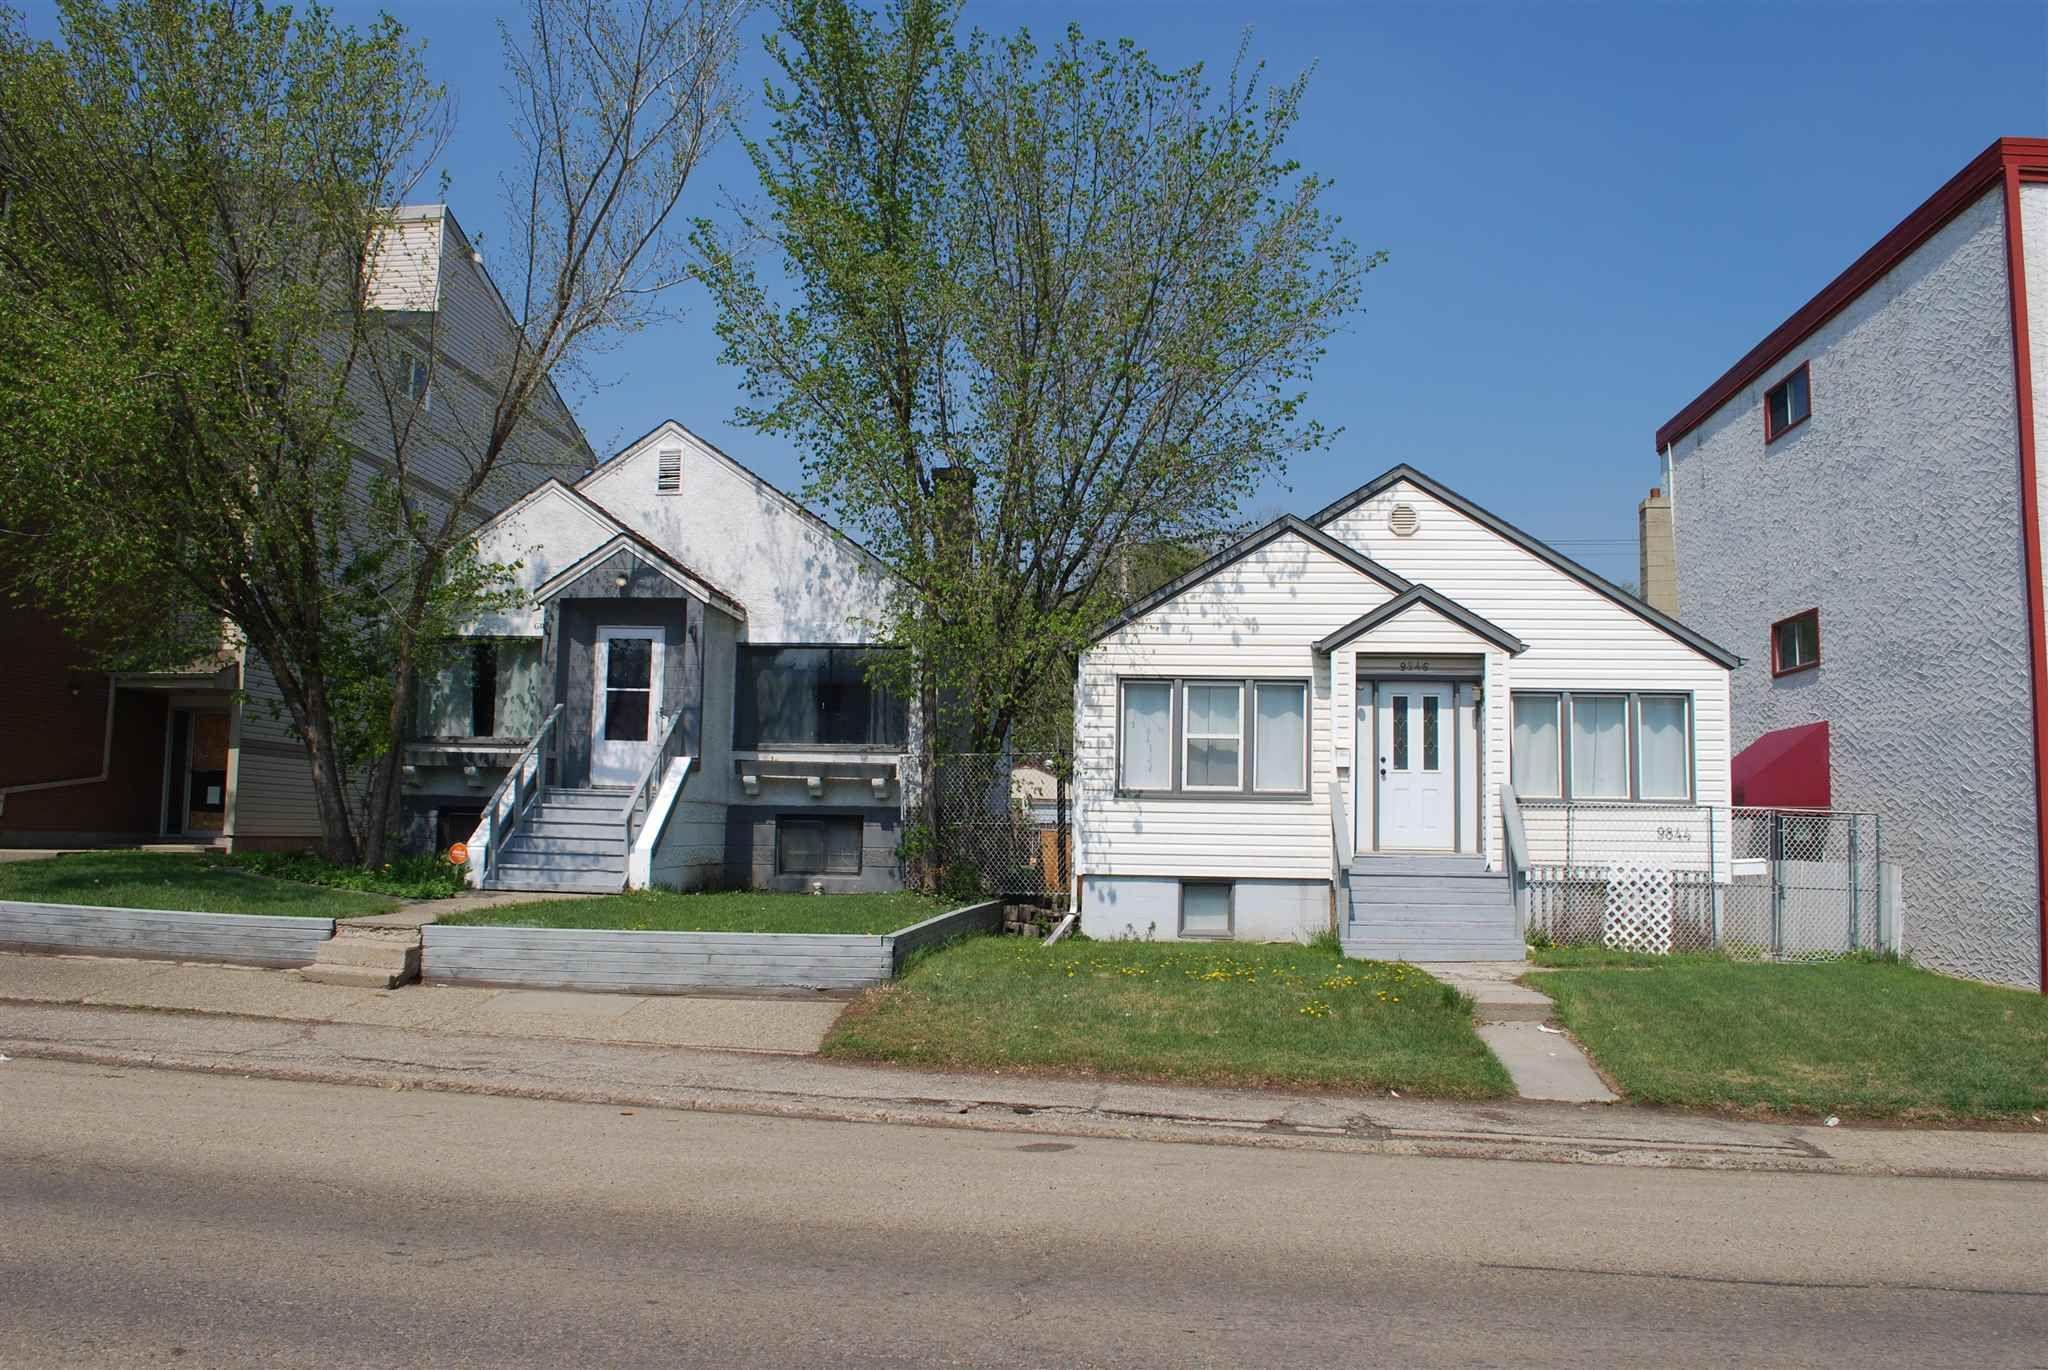 Main Photo: 9846-50 82 Avenue in Edmonton: Zone 15 Land Commercial for sale : MLS®# E4243565